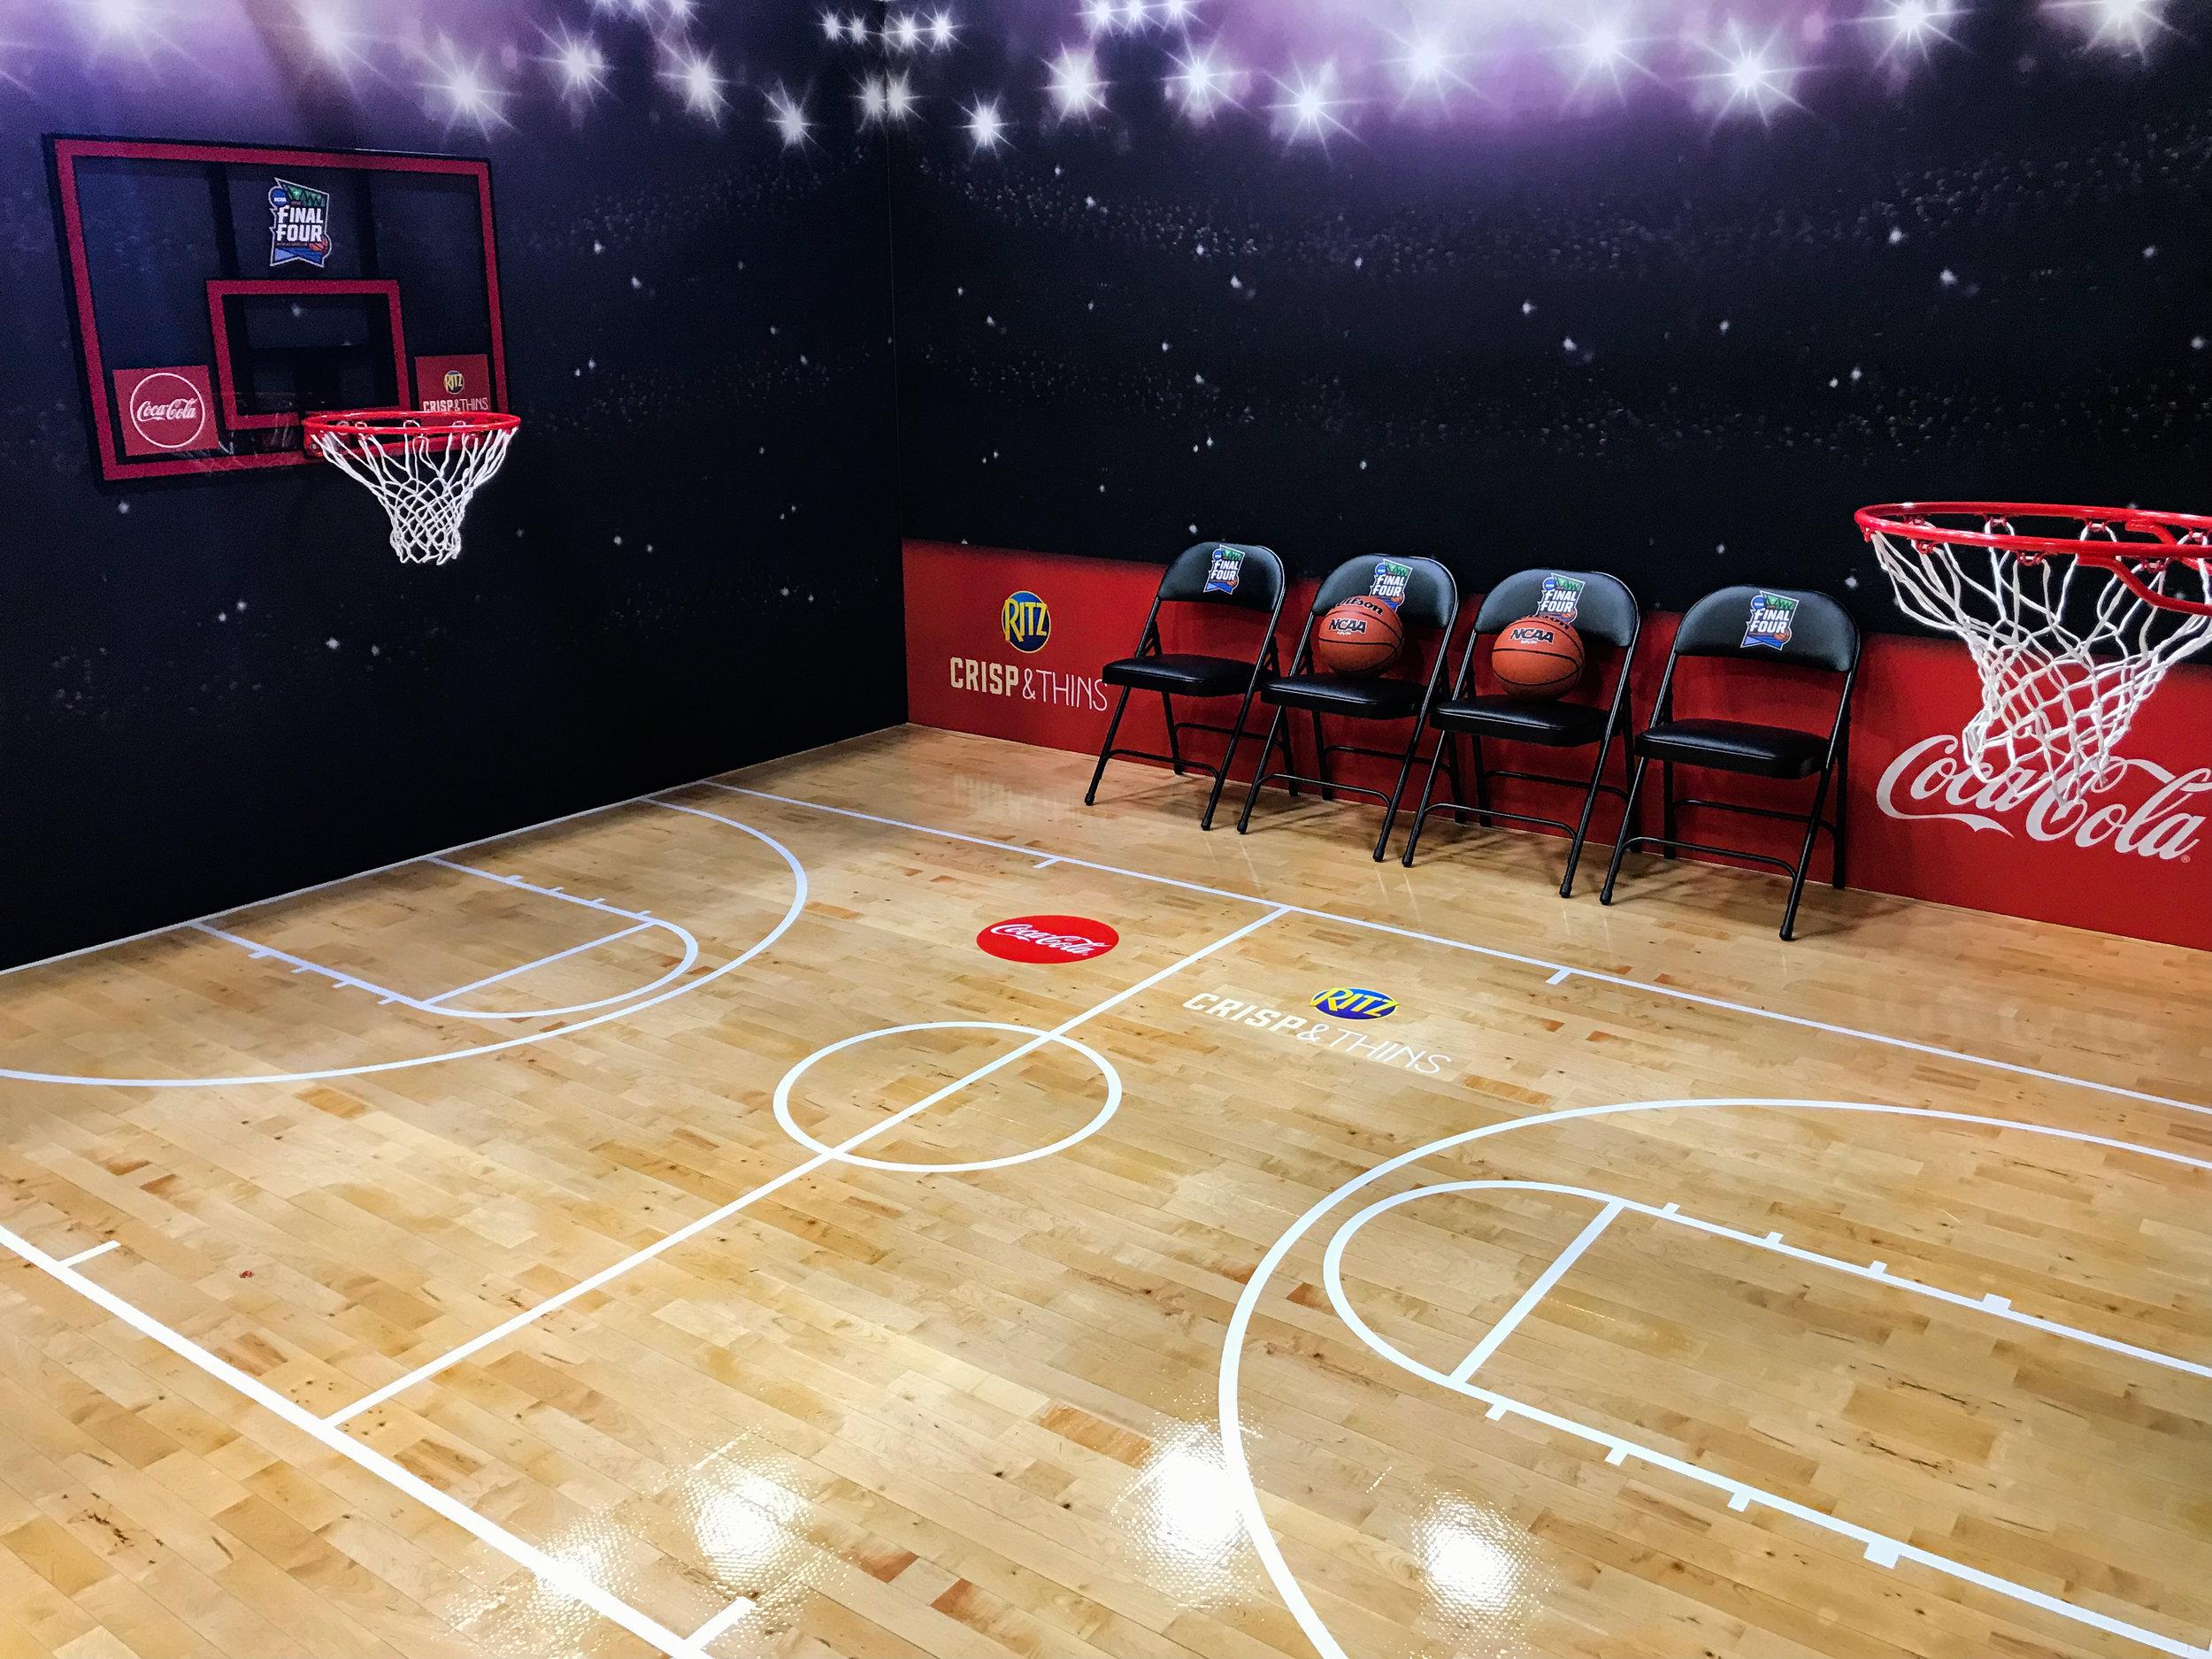 EDD_Coca_Cola_Ritz_NCAA_FanFest-3.jpg